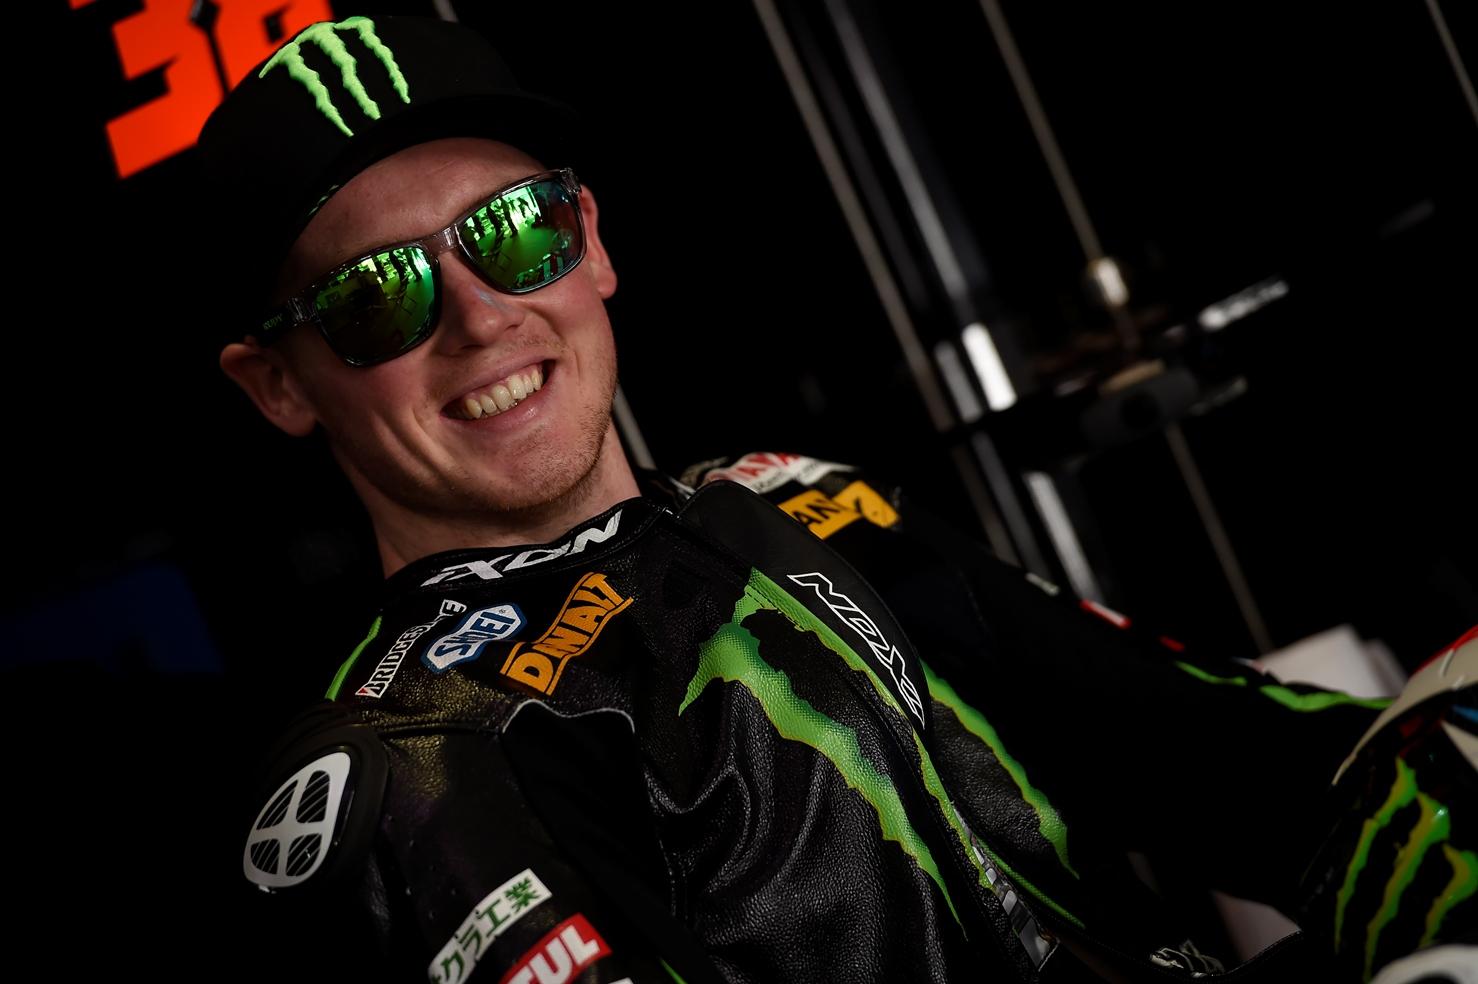 Motogp Cota 2014 Full Race | MotoGP 2017 Info, Video, Points Table